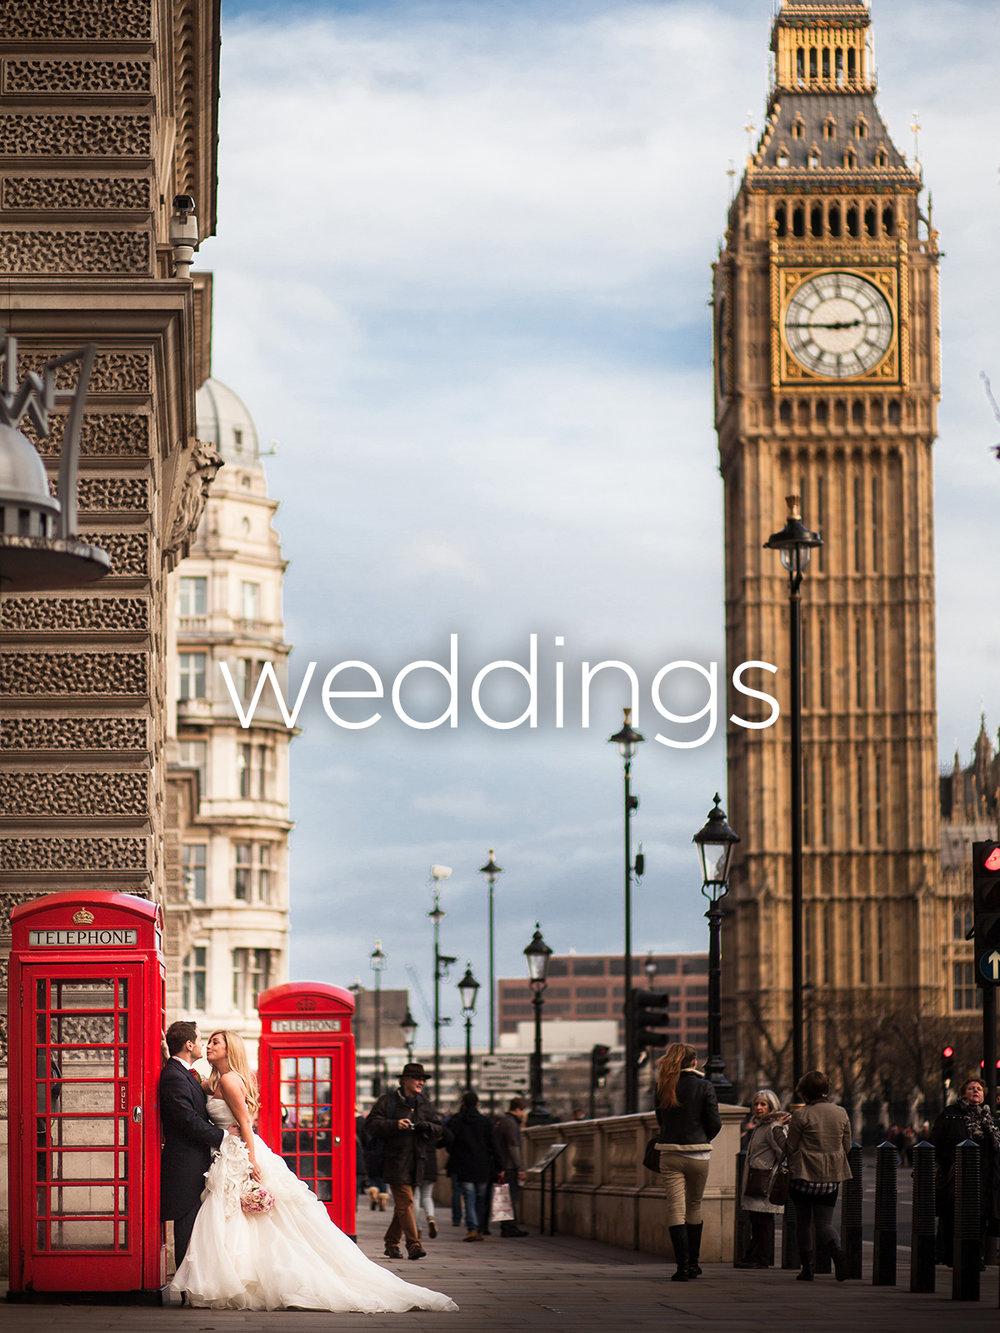 weddings_Unit.jpg